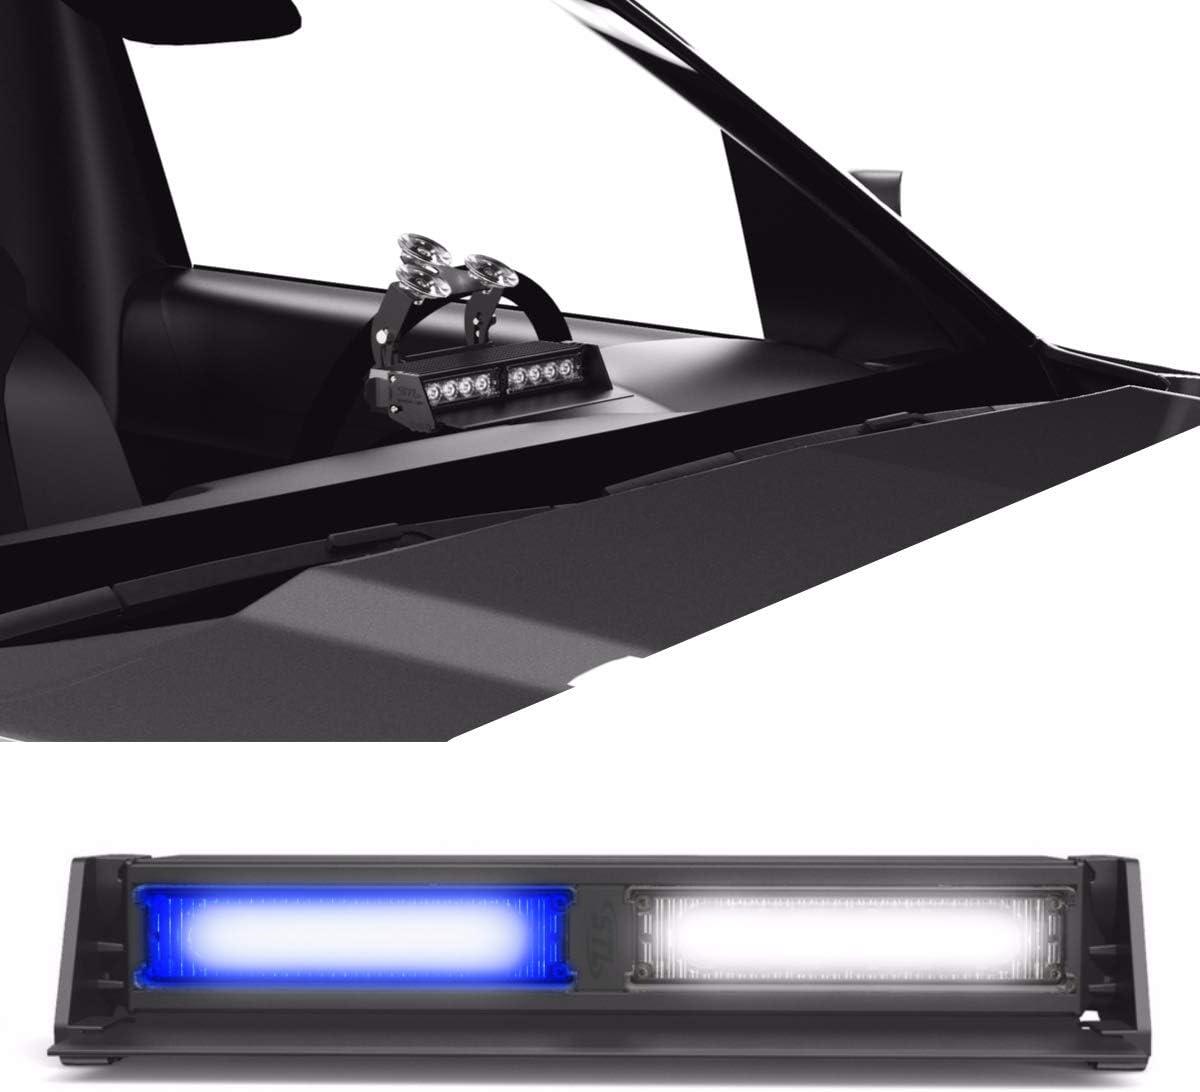 SpeedTech Lights Striker TIR 2 Head LED Strobe Deck Dash Windshield Mount Light Bar for Police, Security, and Emergency Vehicles Hazard Flashing Warning Lights with Cigarette Lighter Plug Blue/Clear